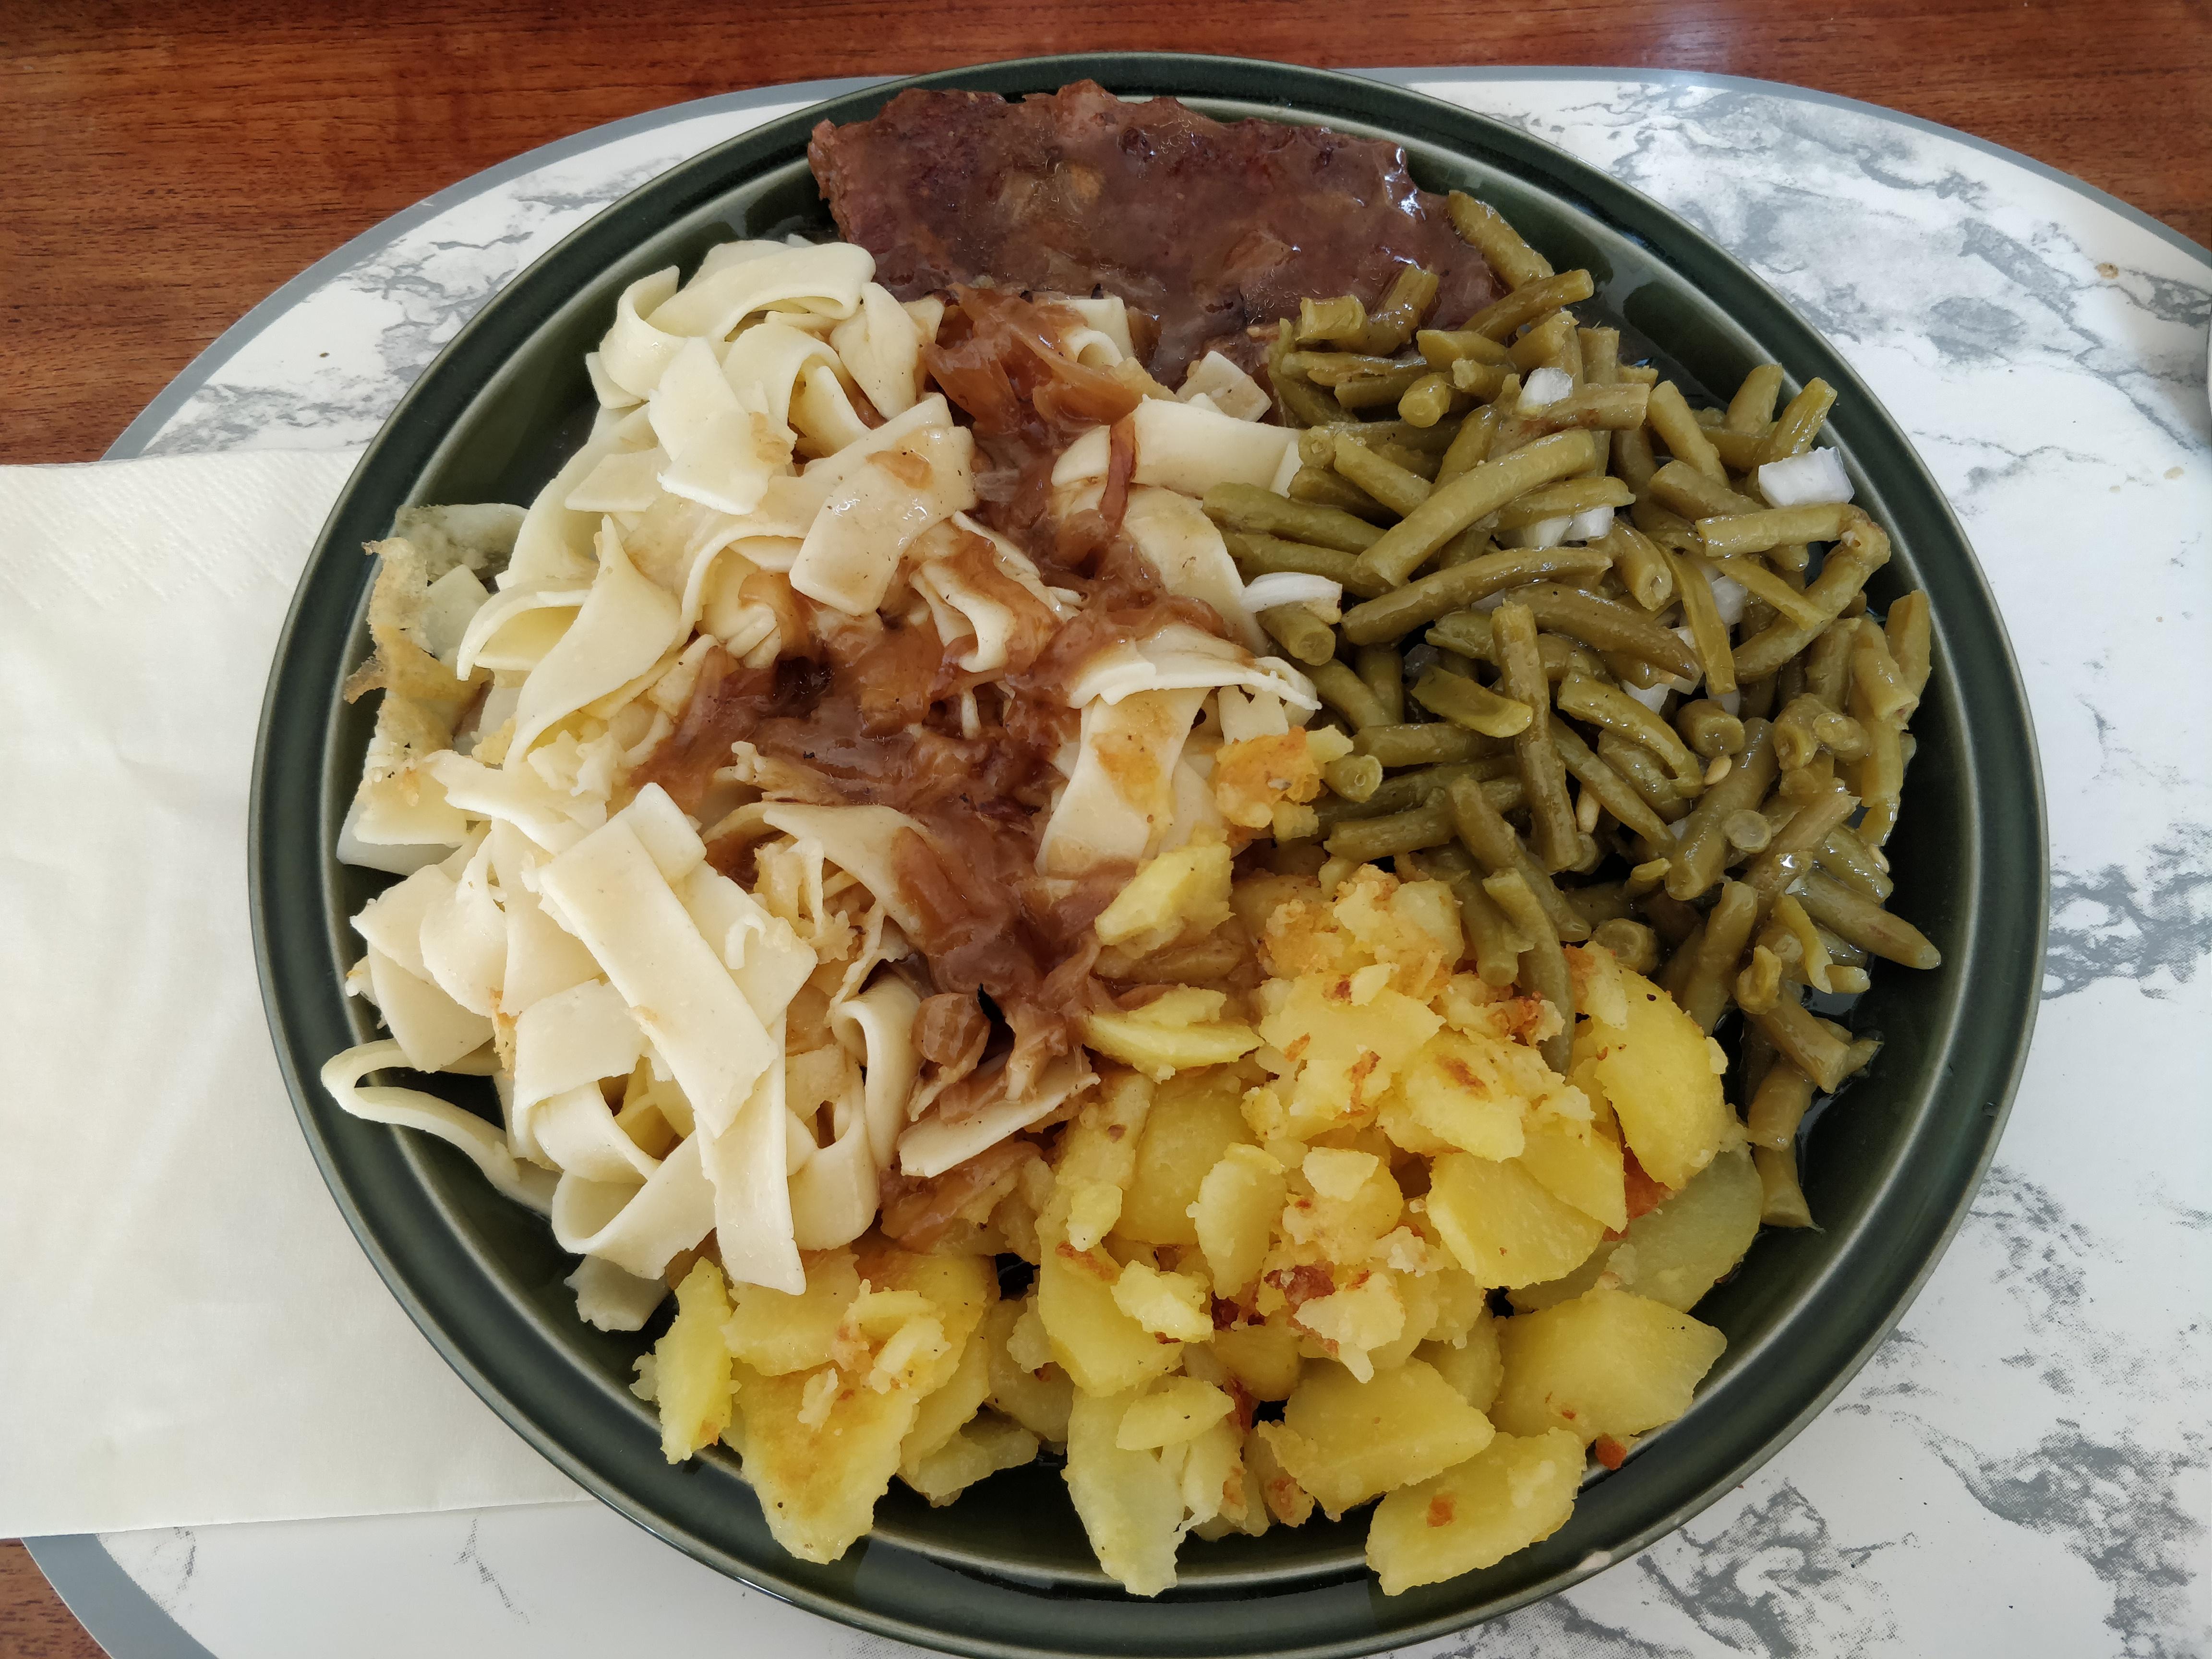 https://foodloader.net/nico_2018-10-17_rostbraten-bratkartoffeln-nudeln-bohnensalat.jpg